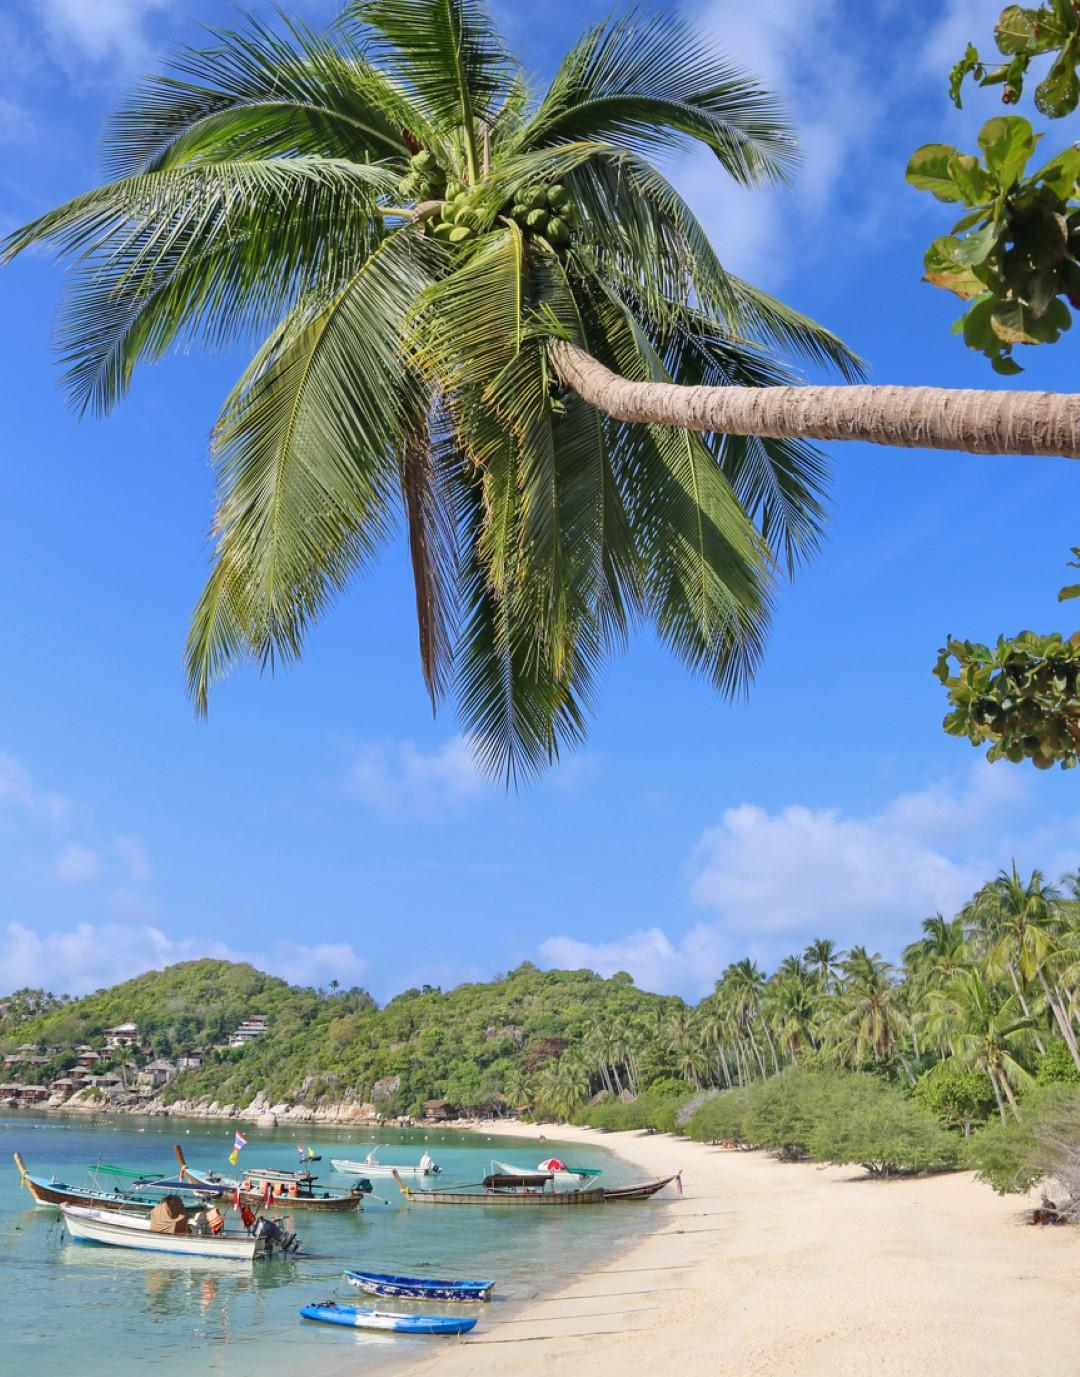 Le isole thailandesi nel Mar delle Andamane